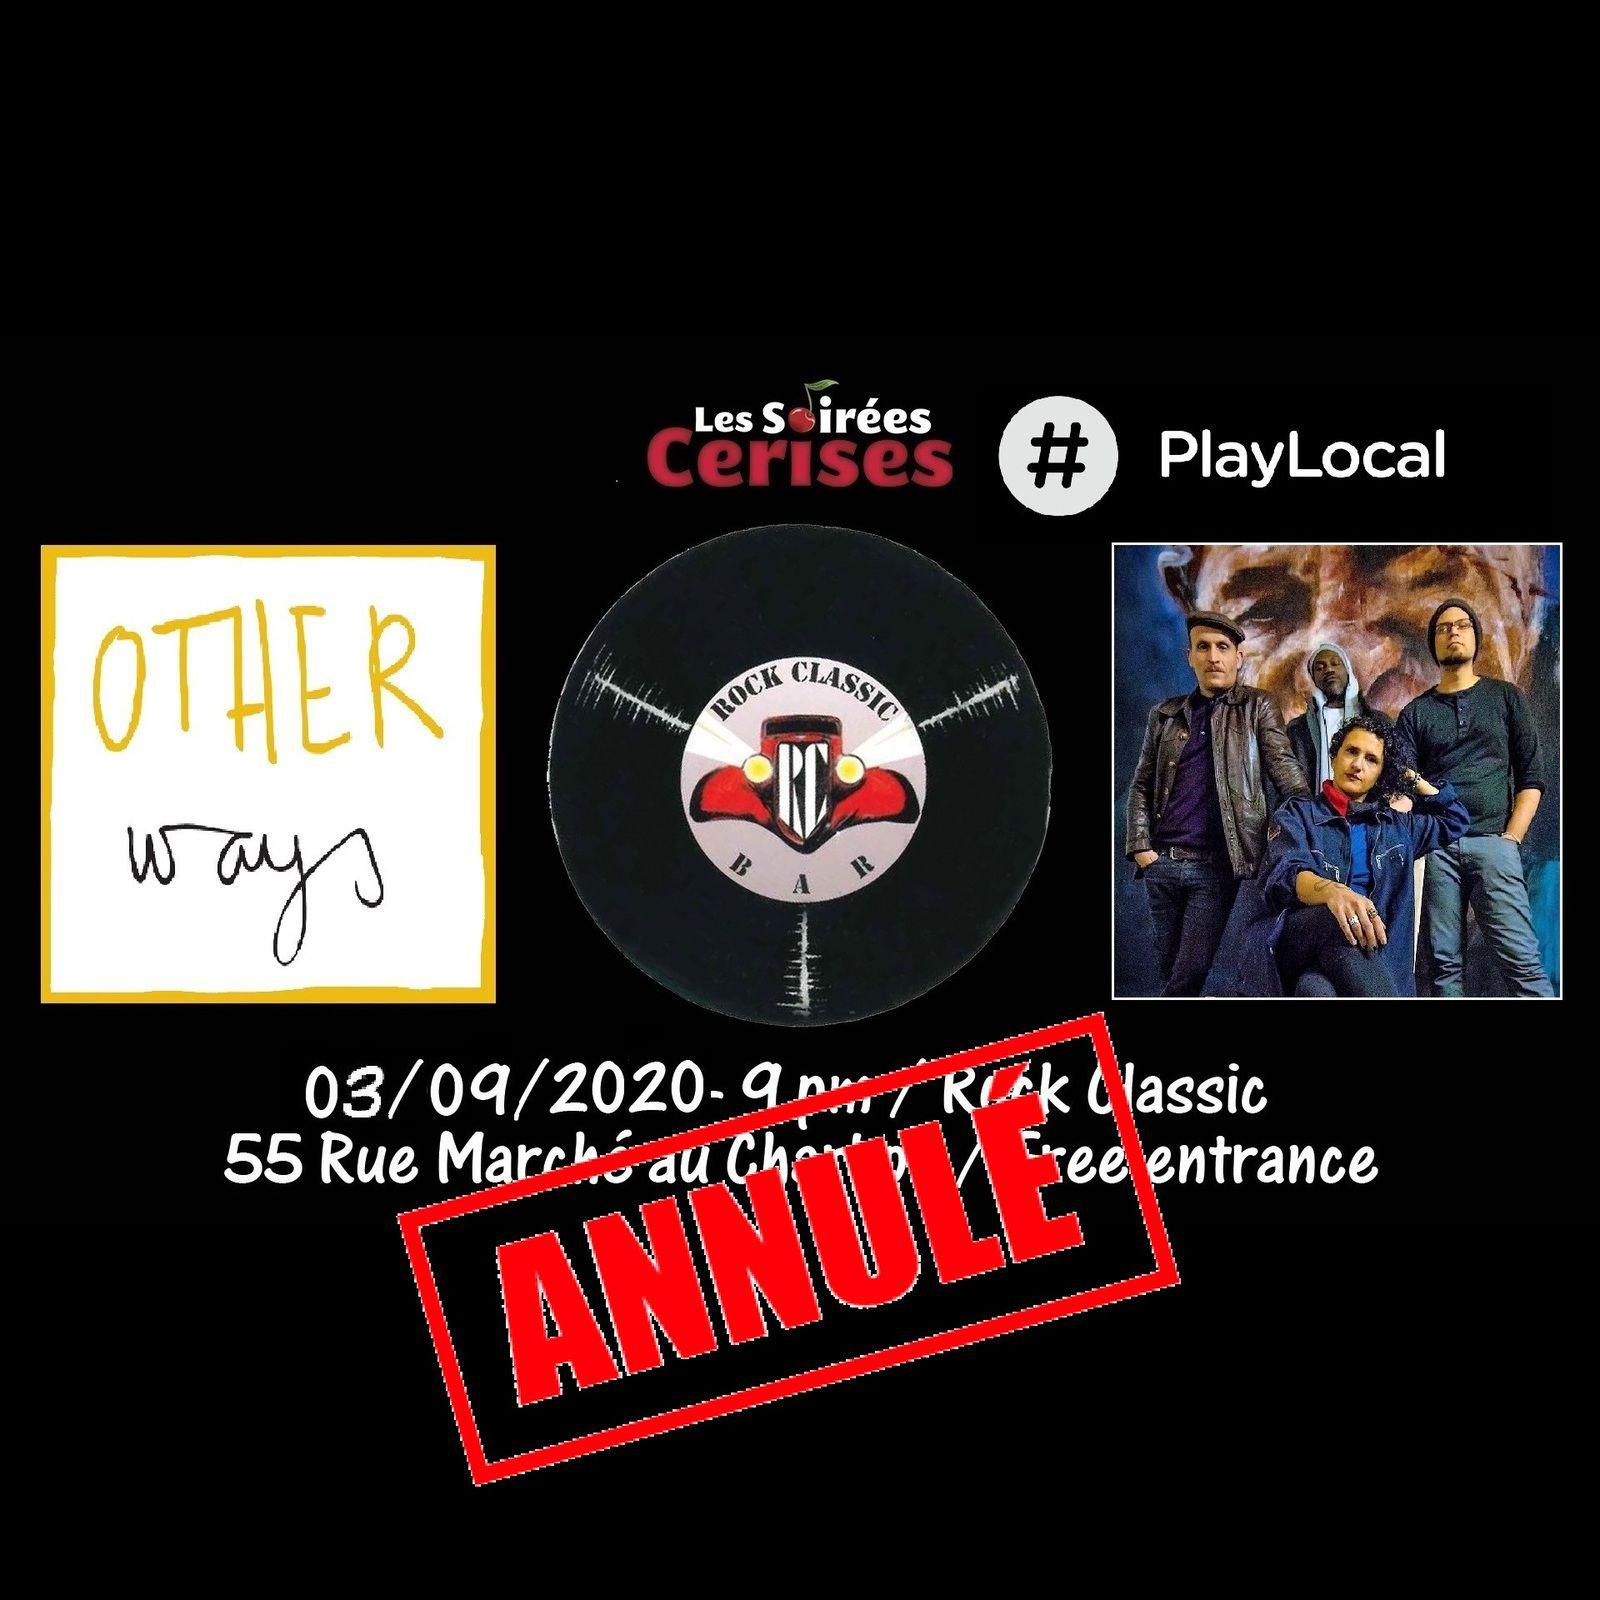 🎵 Other ways @ Rock Classic - 03/09/2020 - annulé